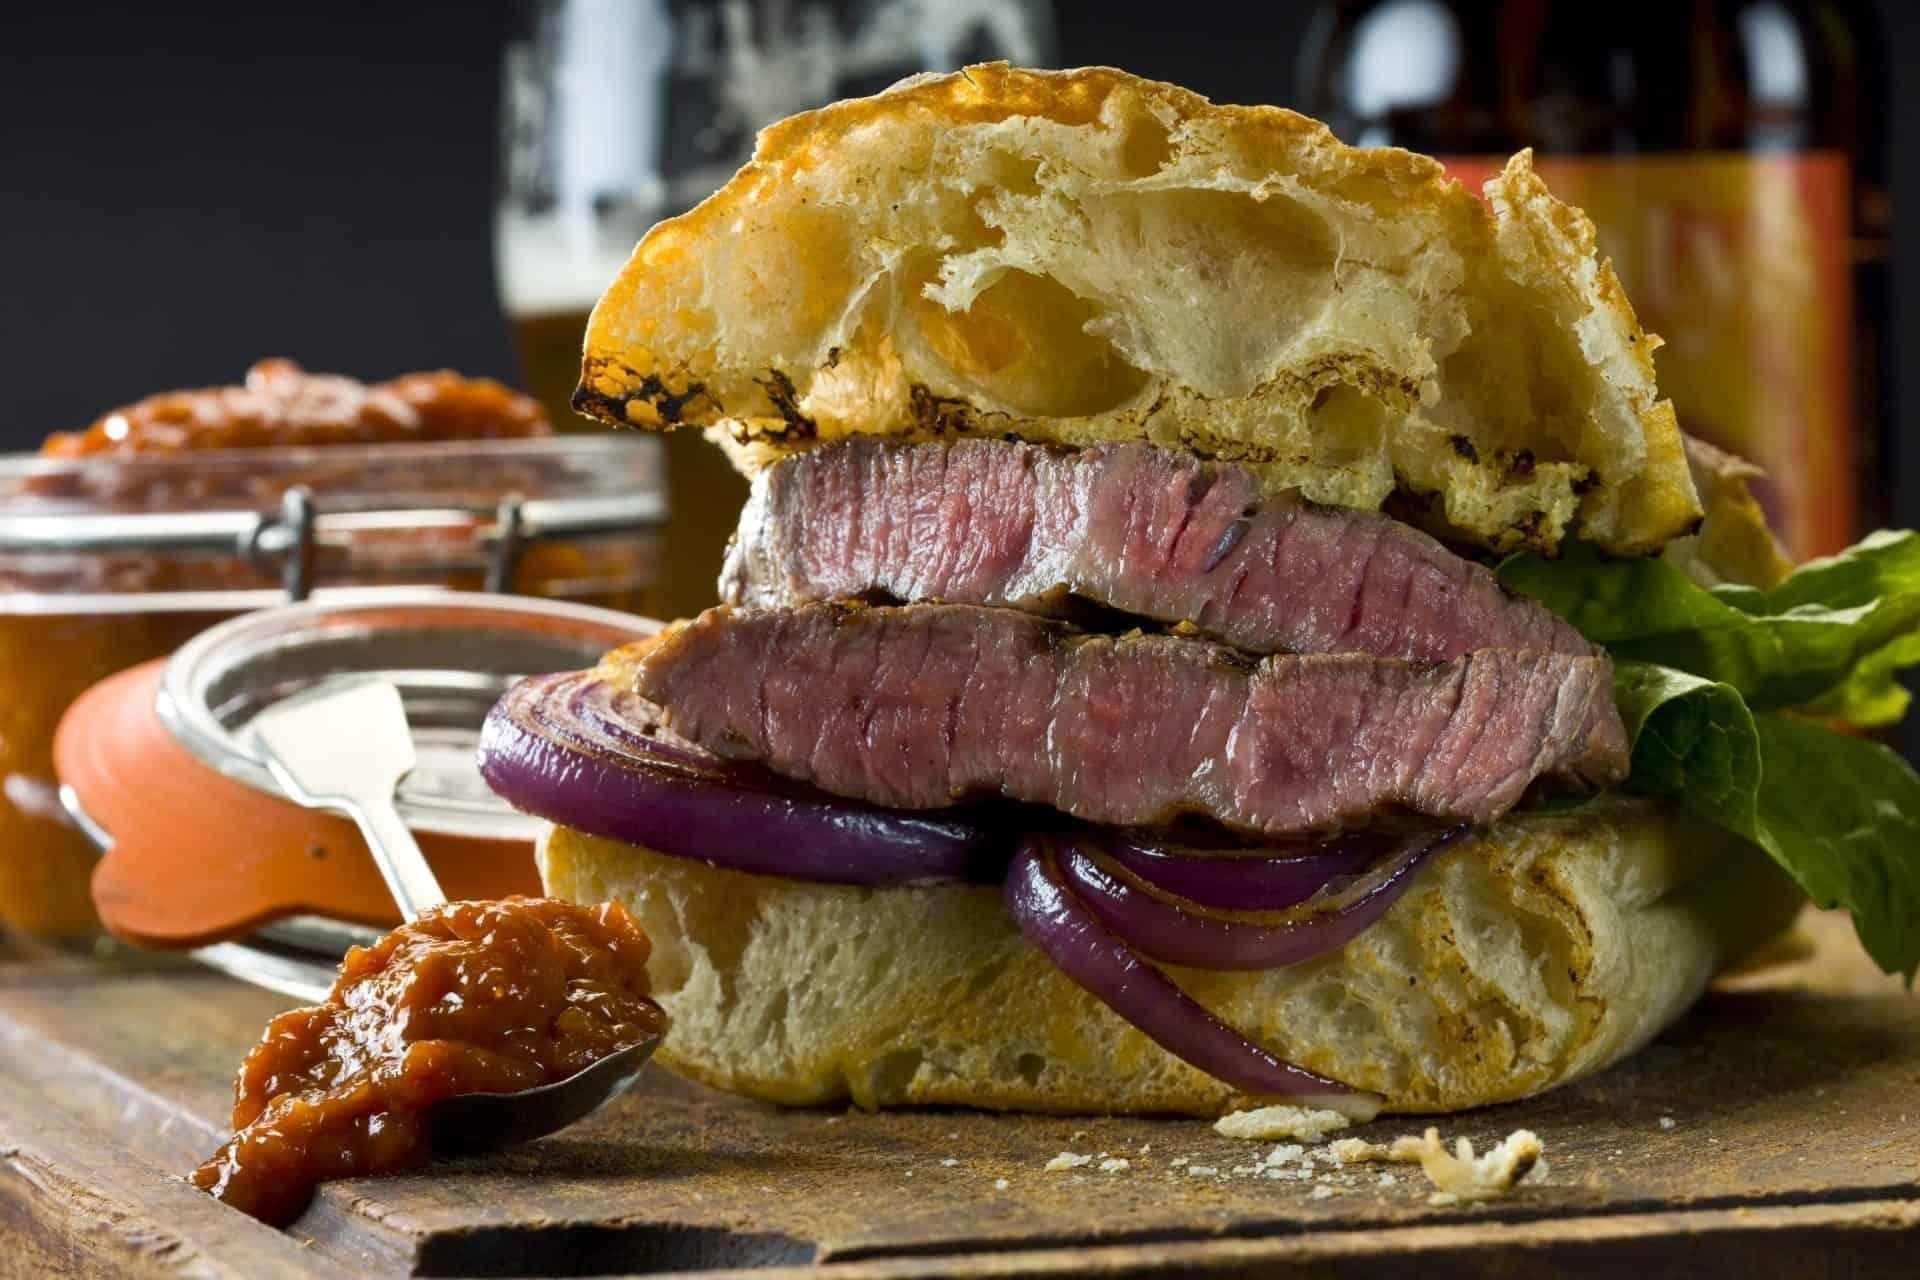 A burger with Chutney Relish